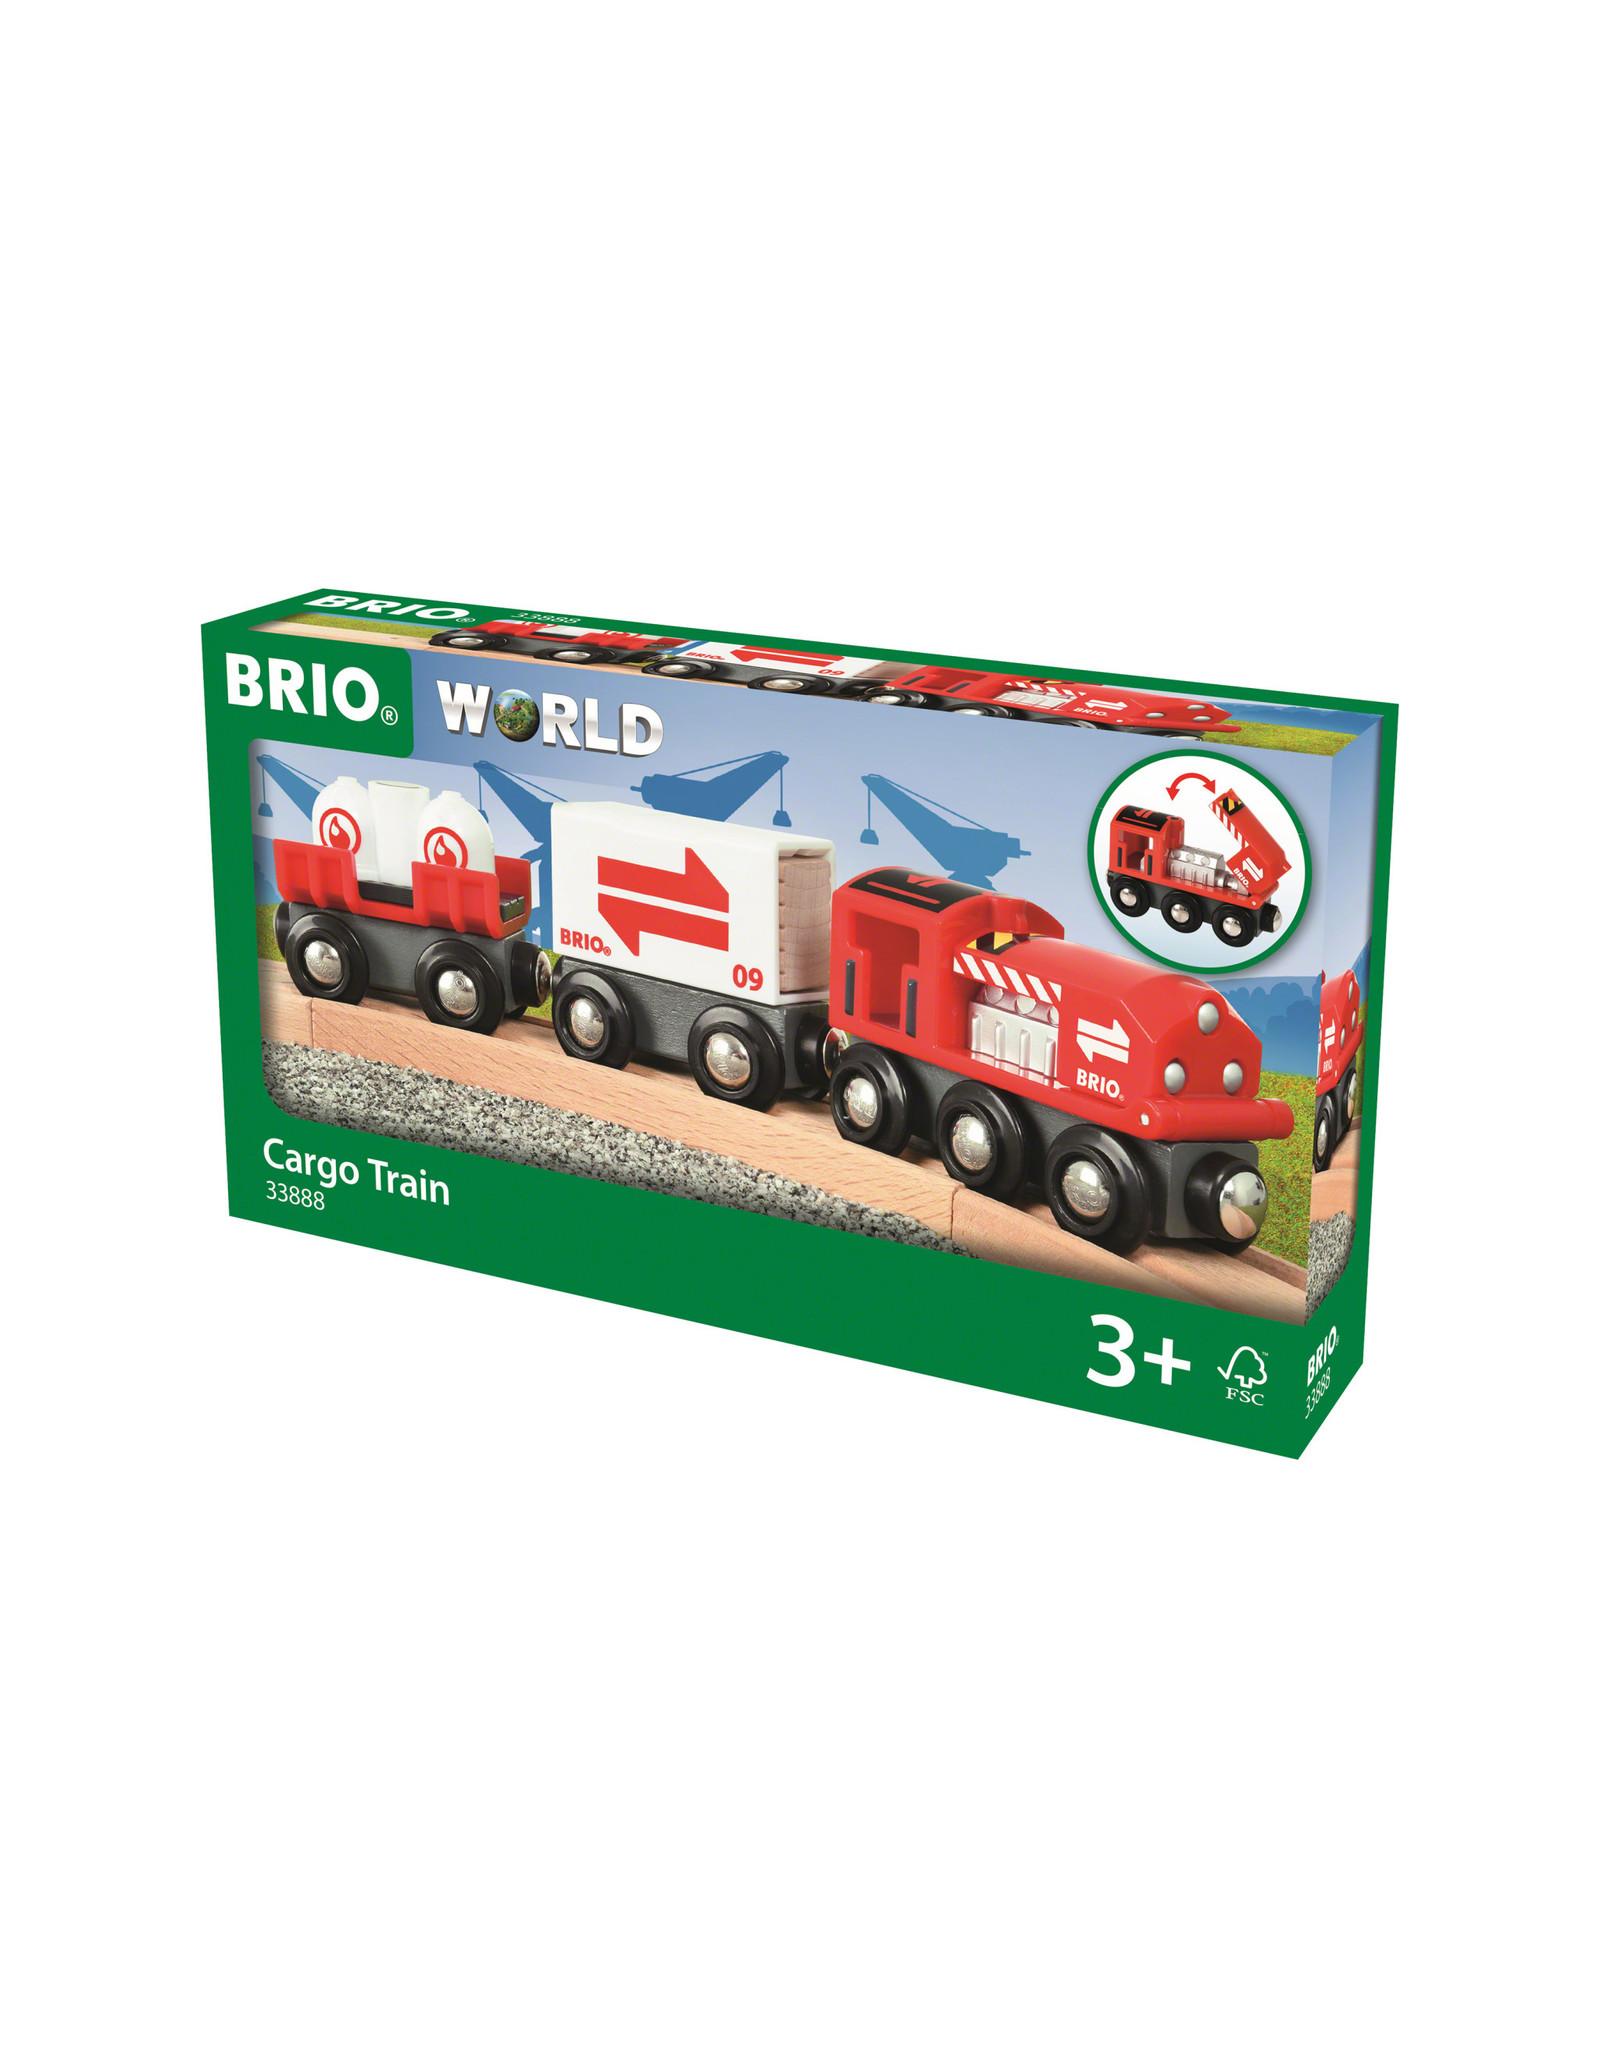 BRIO CORPORATION Cargo Train